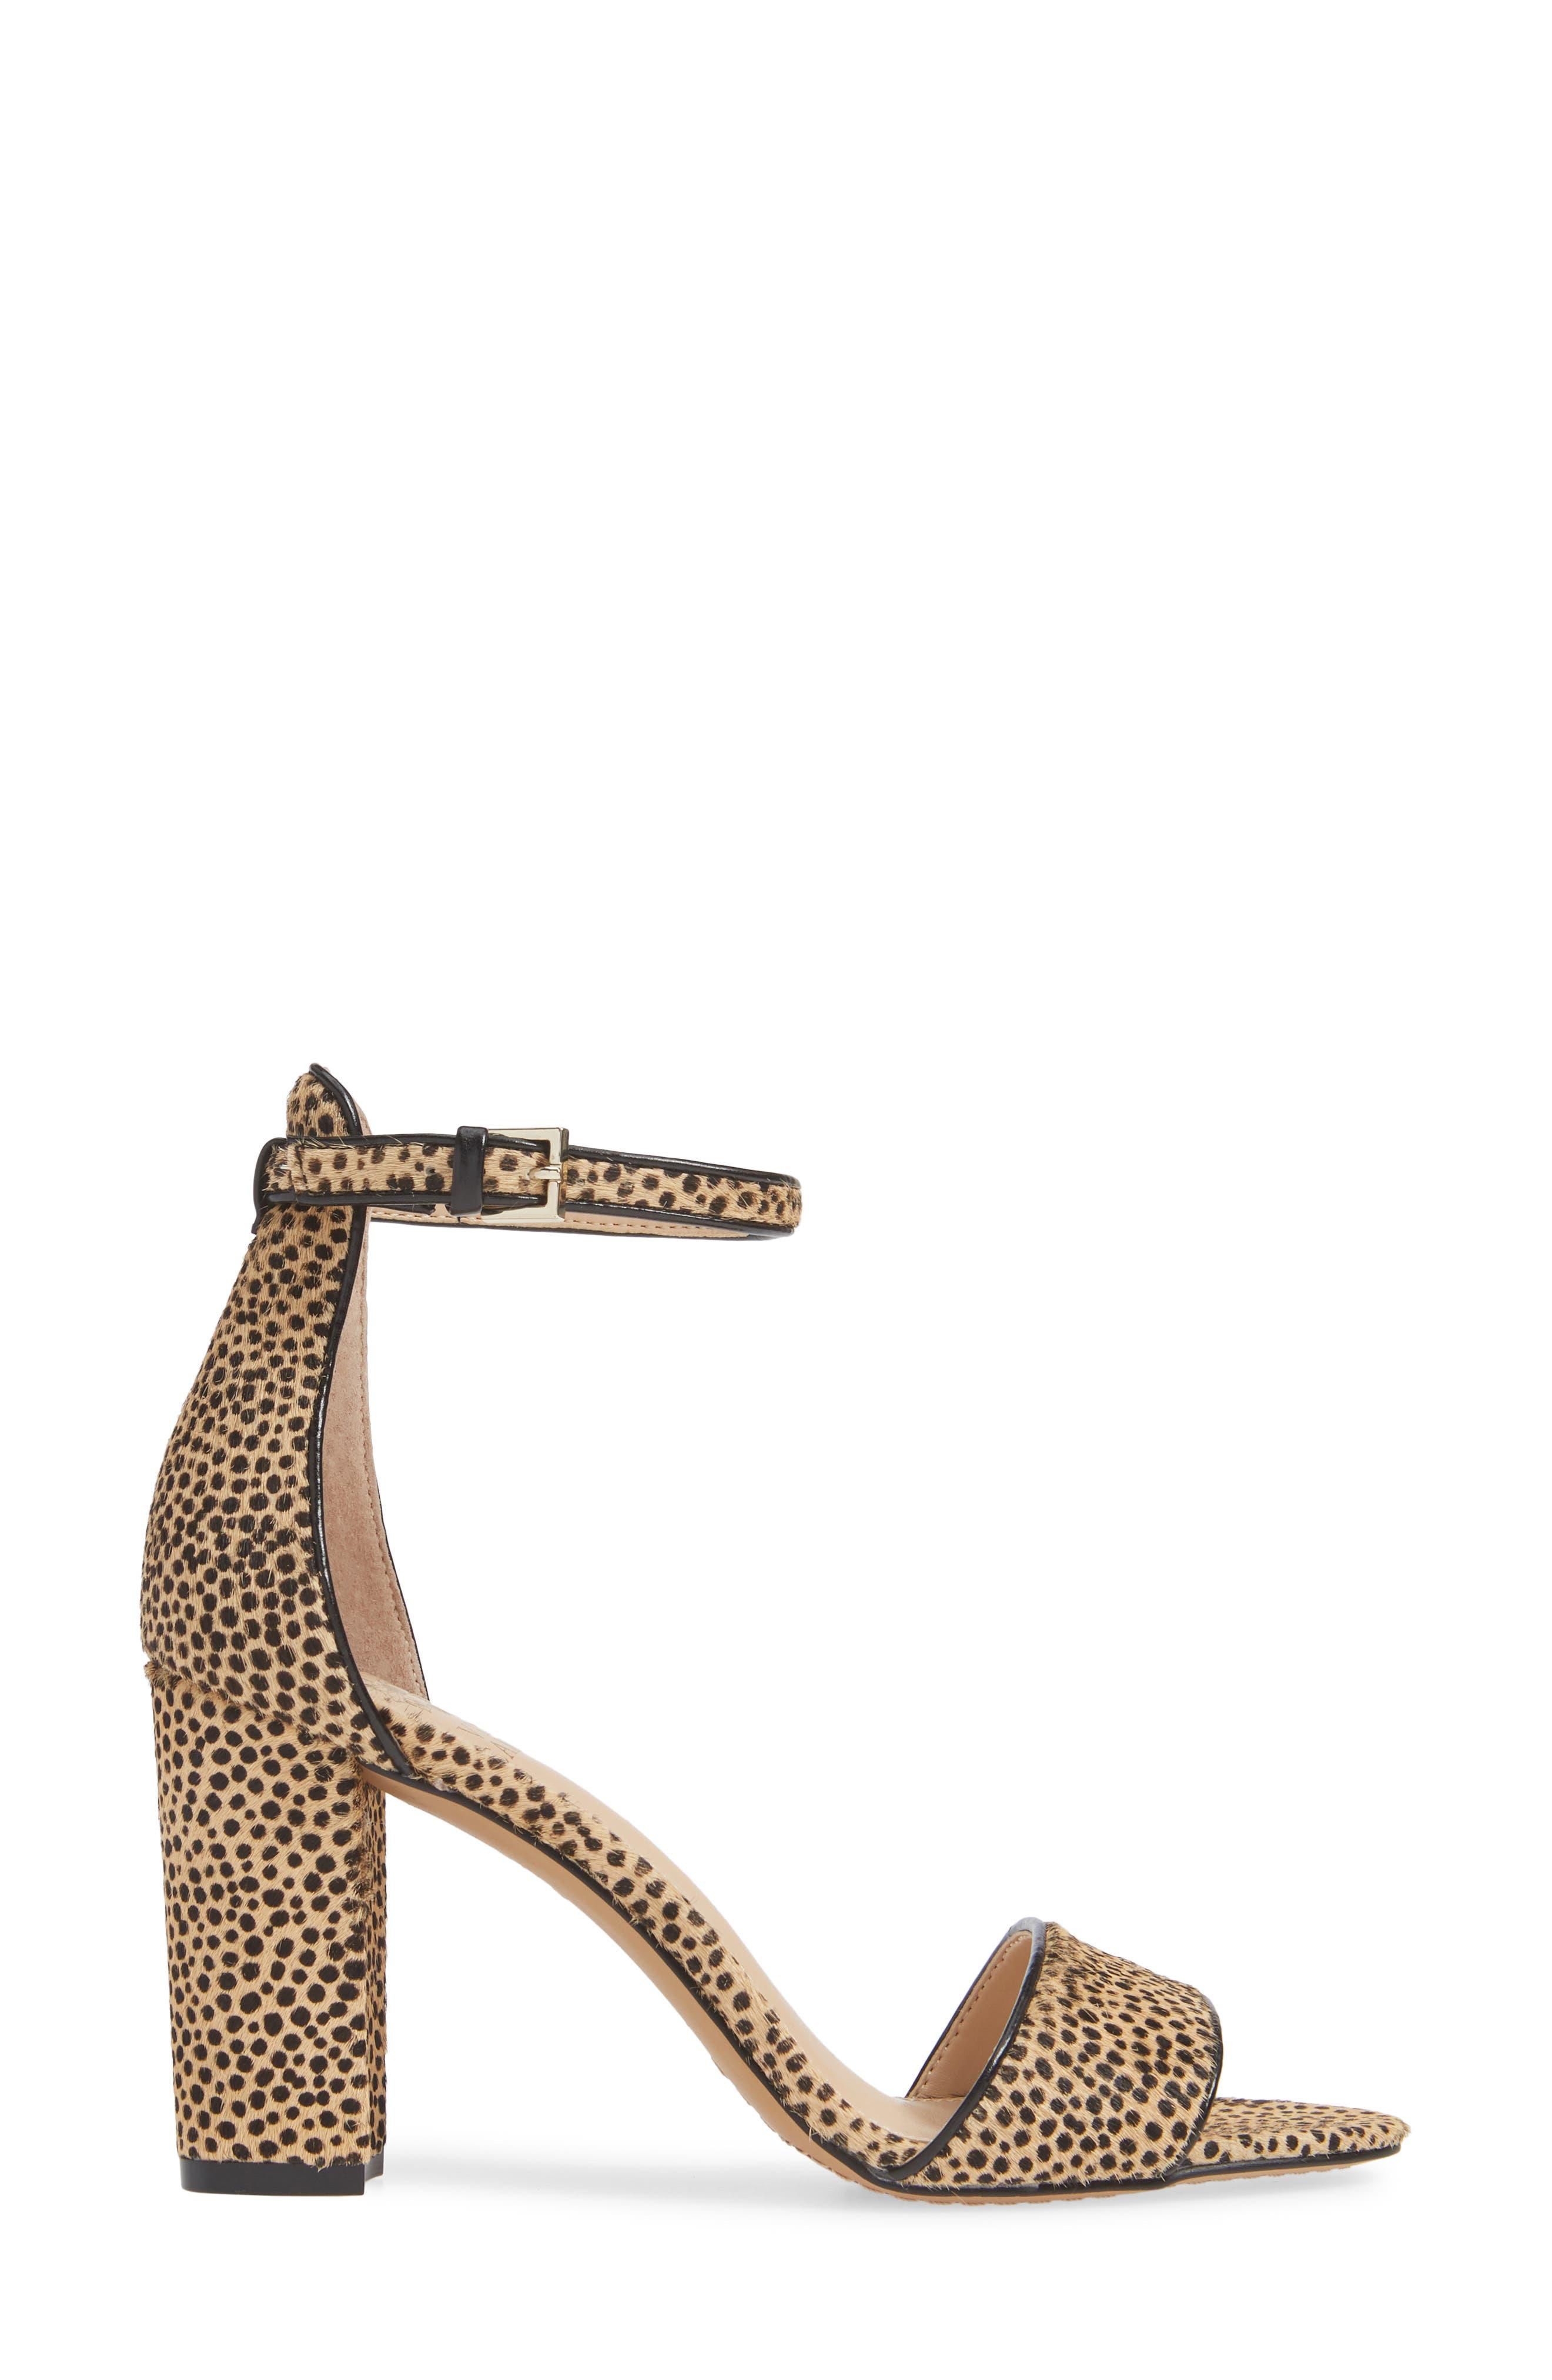 Corlina Genuine Calf Hair Ankle Strap Sandal,                             Alternate thumbnail 3, color,                             NATURAL SPOTTED CALF HAIR